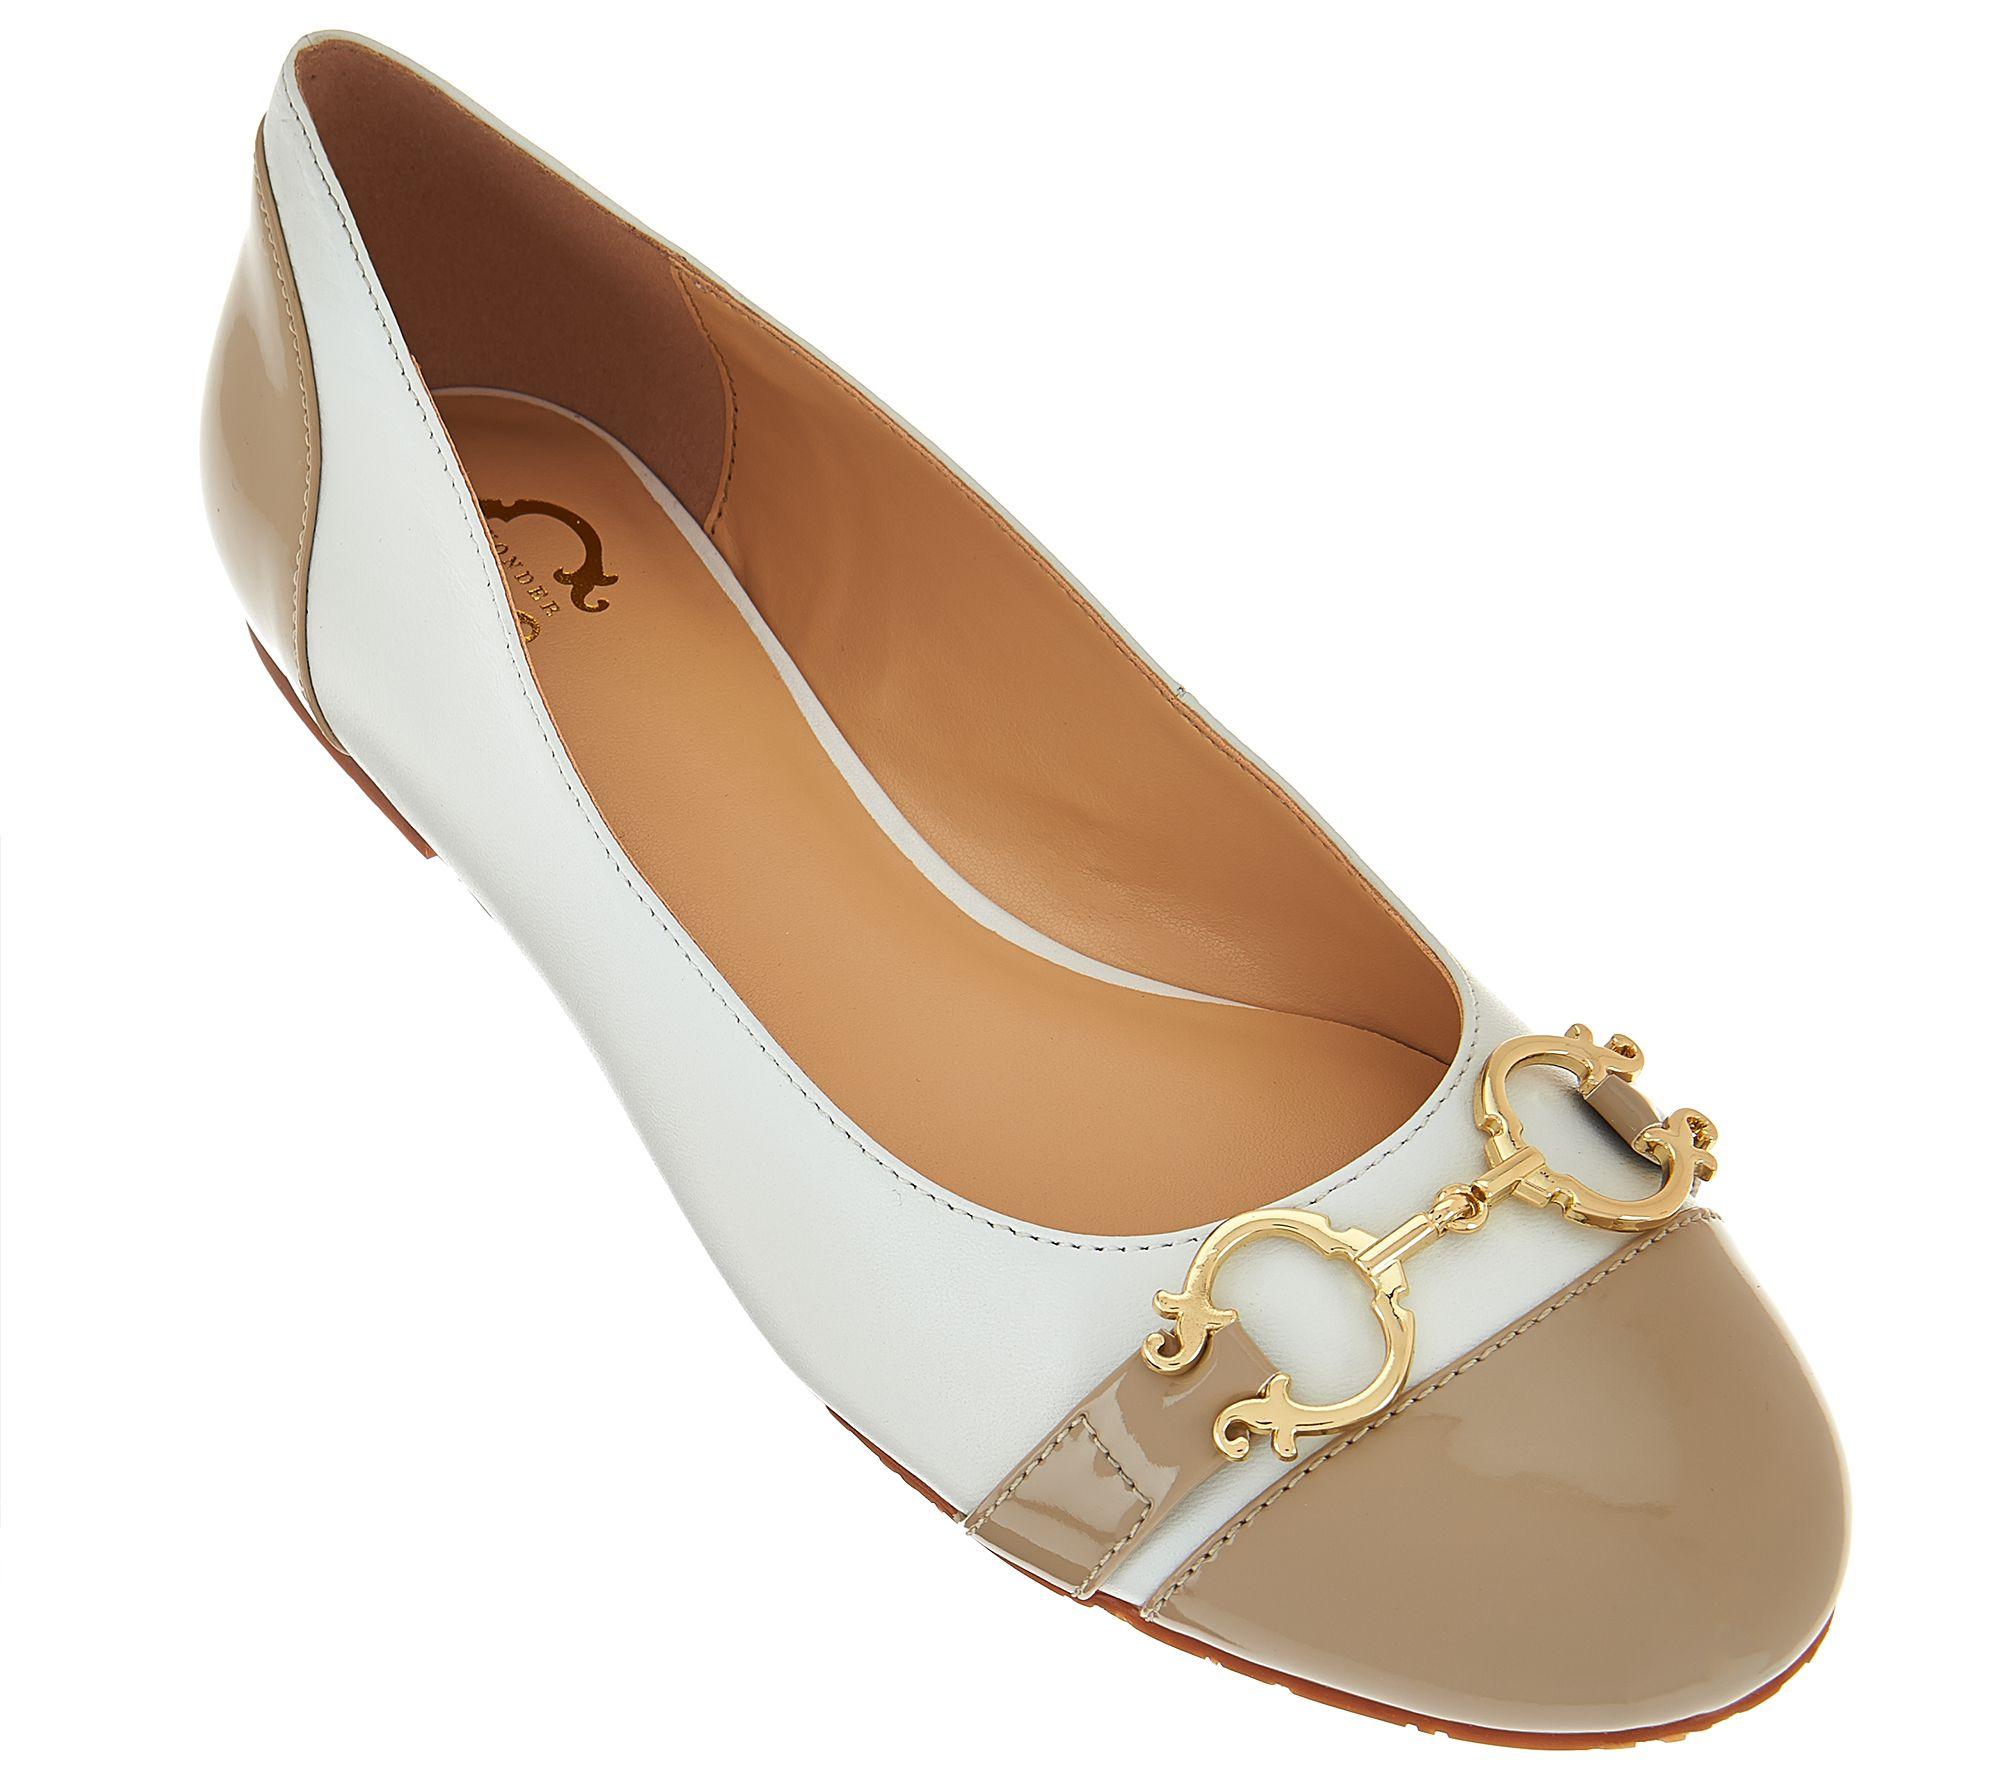 main flats womens orthotic erica black shoes comforter flat worldwide ballet comfortable comfort aetrex